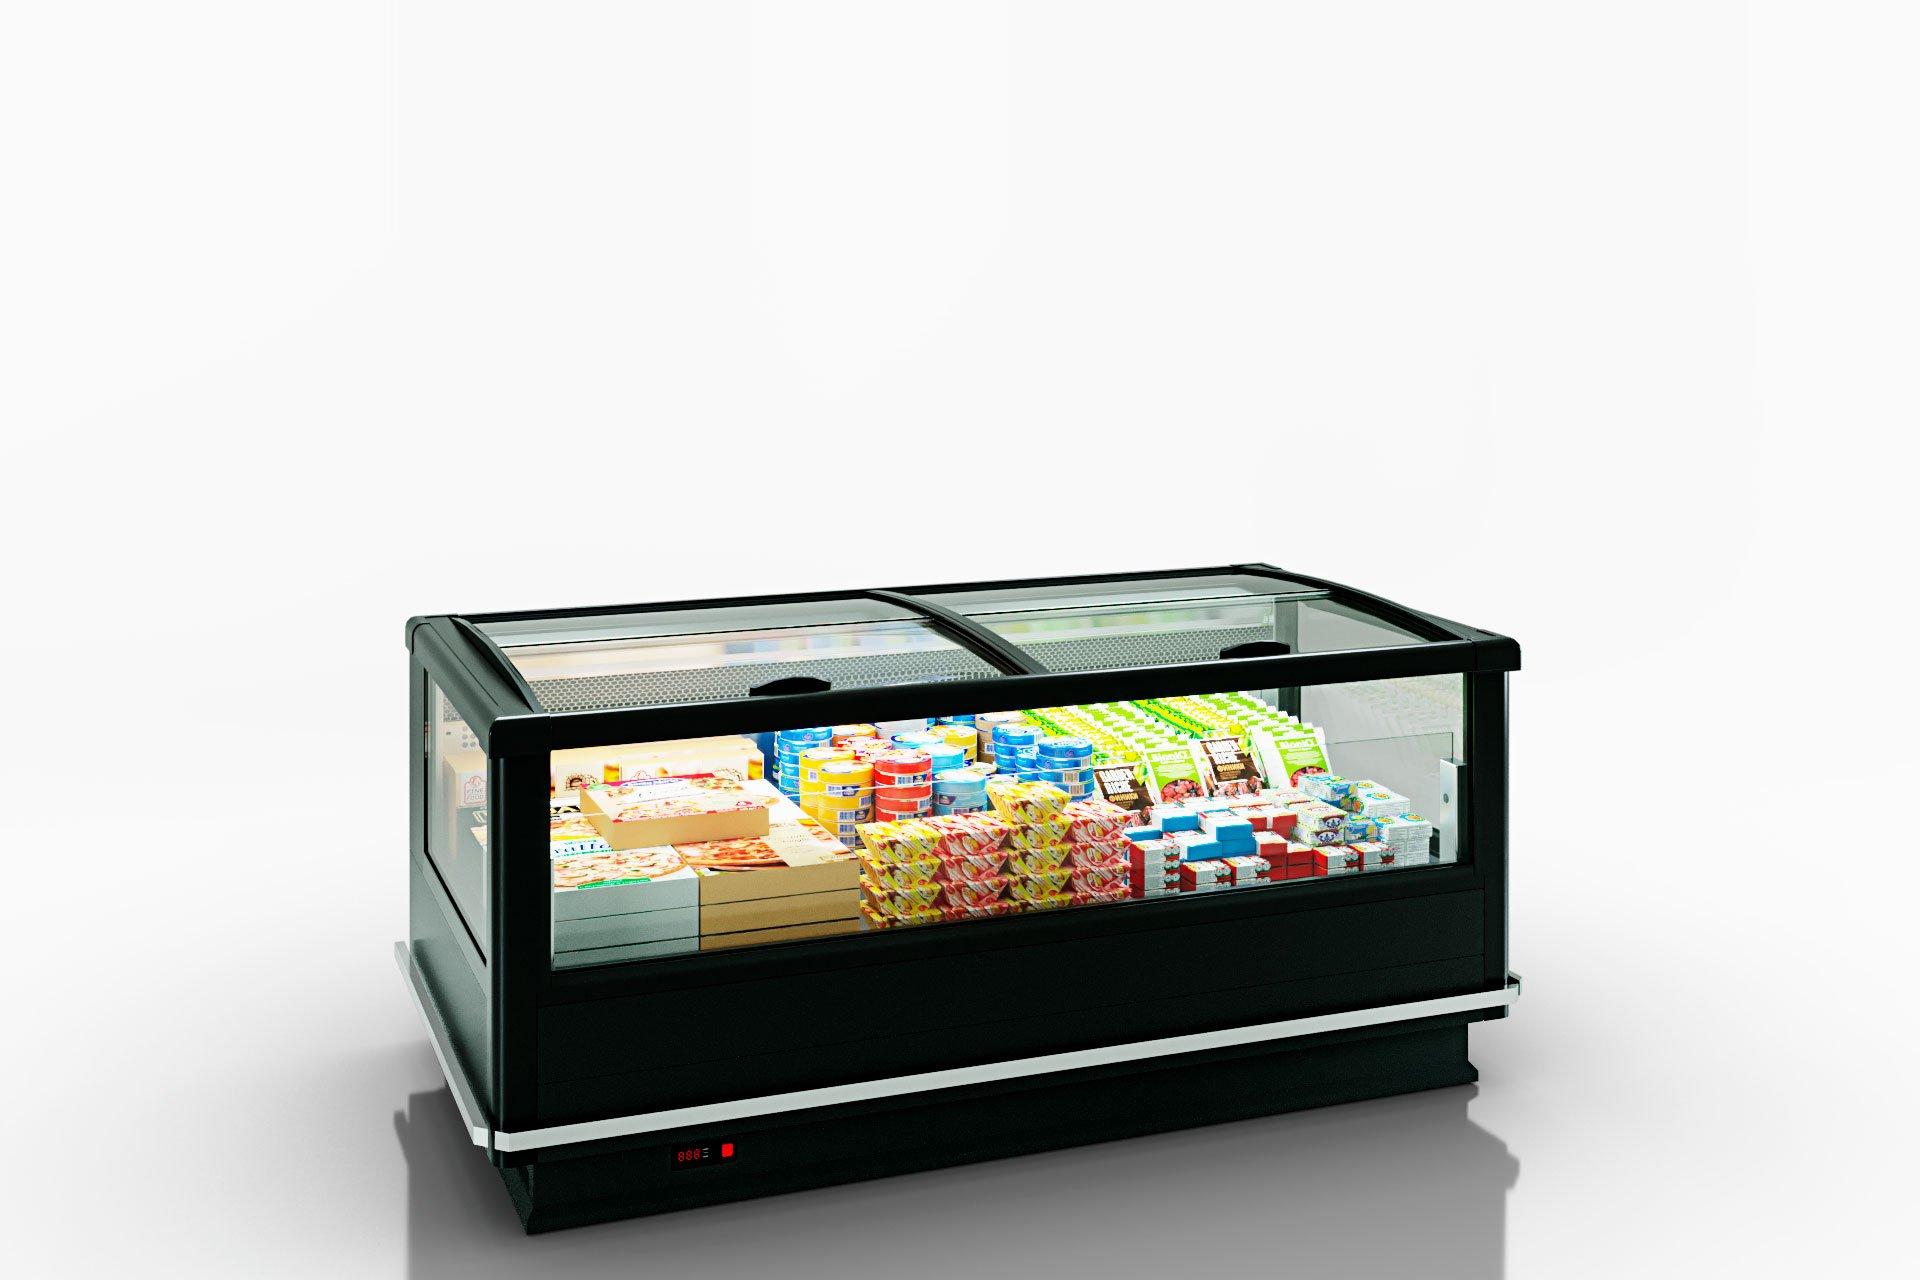 Frozen foods units Alaska wall MV 100 LT C M